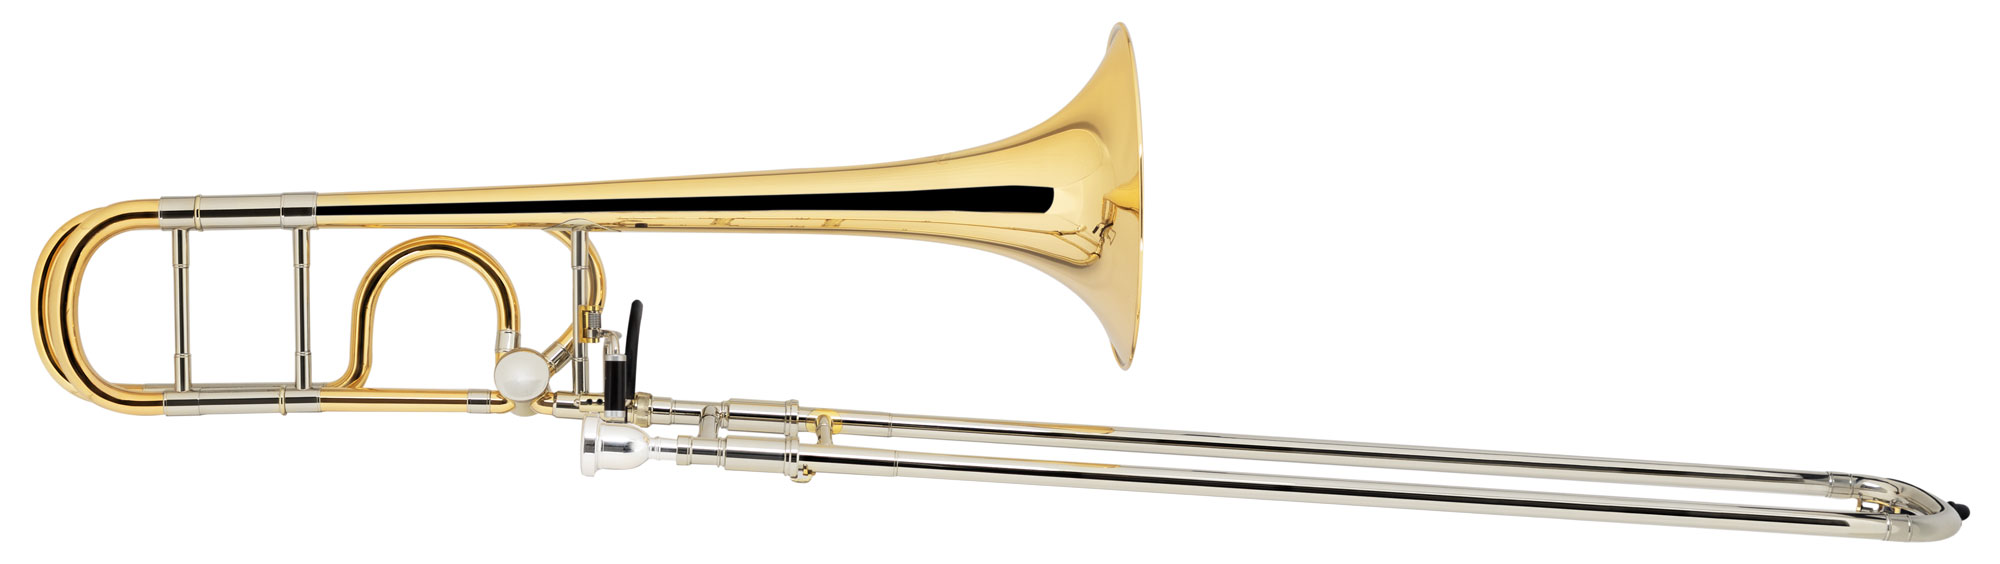 Posaunen - Lechgold QP 17GMs Quartposaune Goldmessing - Onlineshop Musikhaus Kirstein